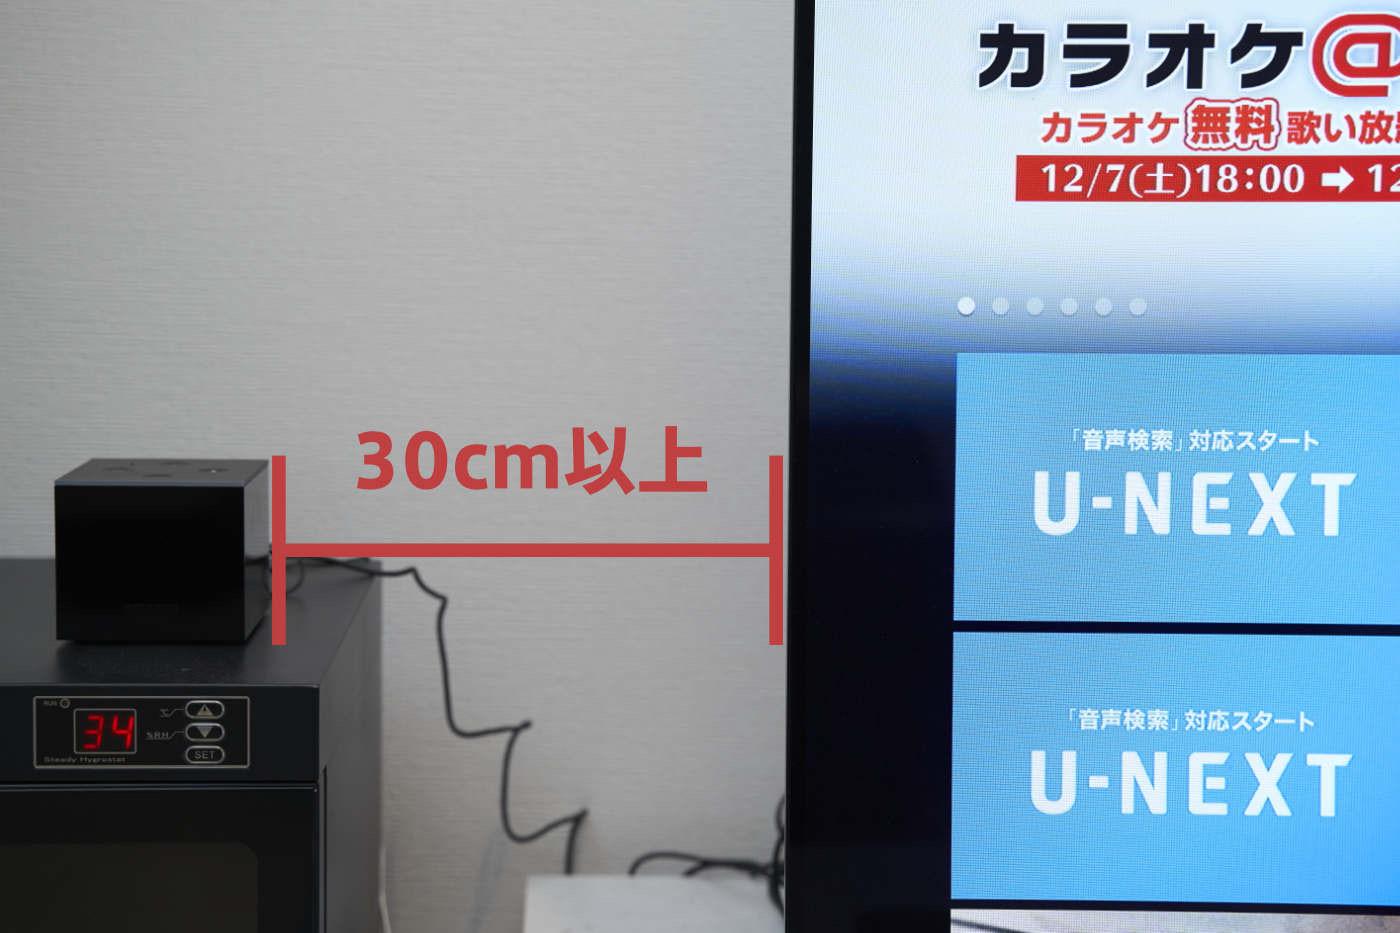 FIre TV CUBEは30cm以上話す必要がある